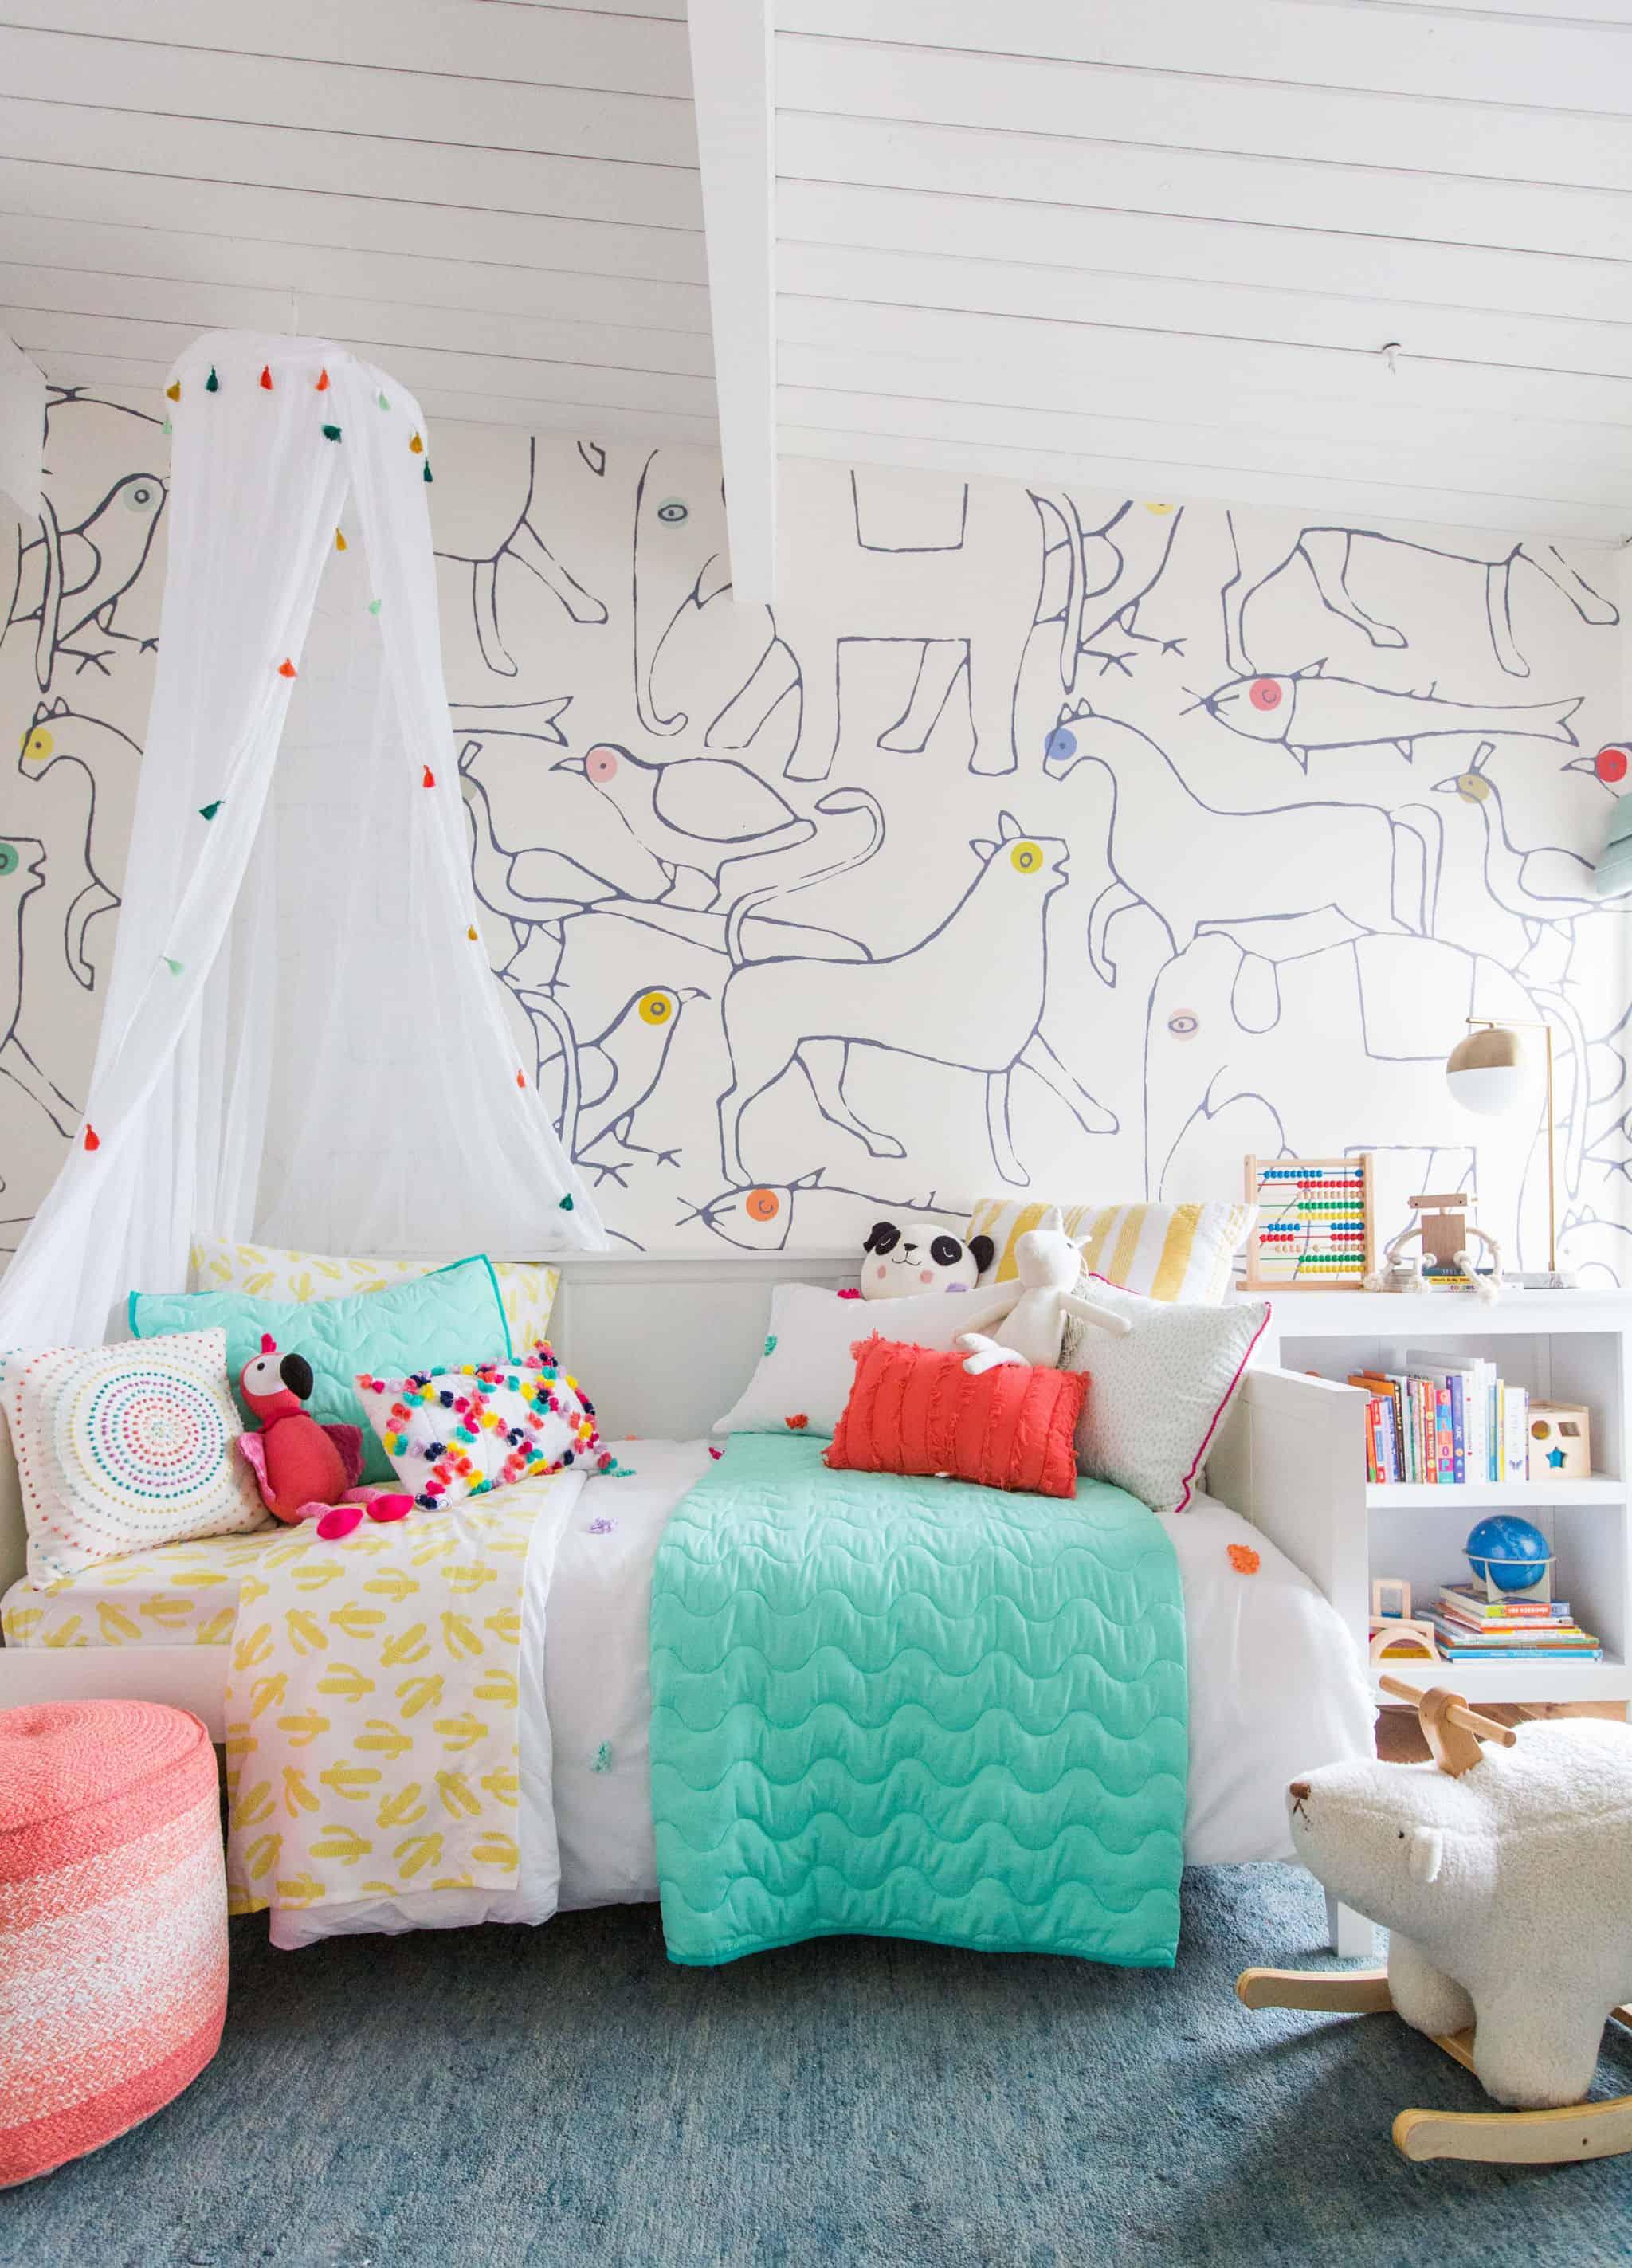 emily-henderson_kids-room_target_bedding_layered_light_texture_blue_white_brass_nursery_girls-room_bright_18